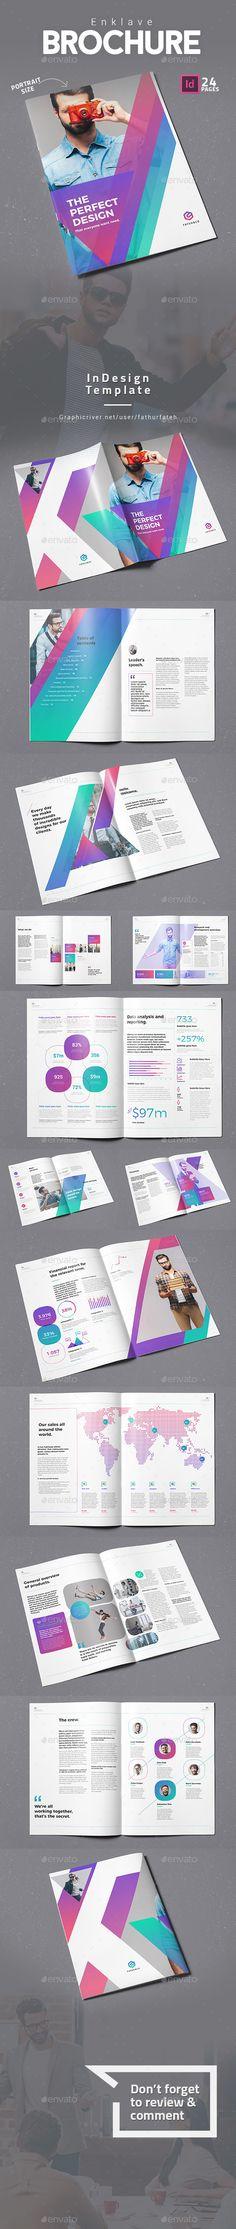 Enklave Brochure - Corporate Brochures